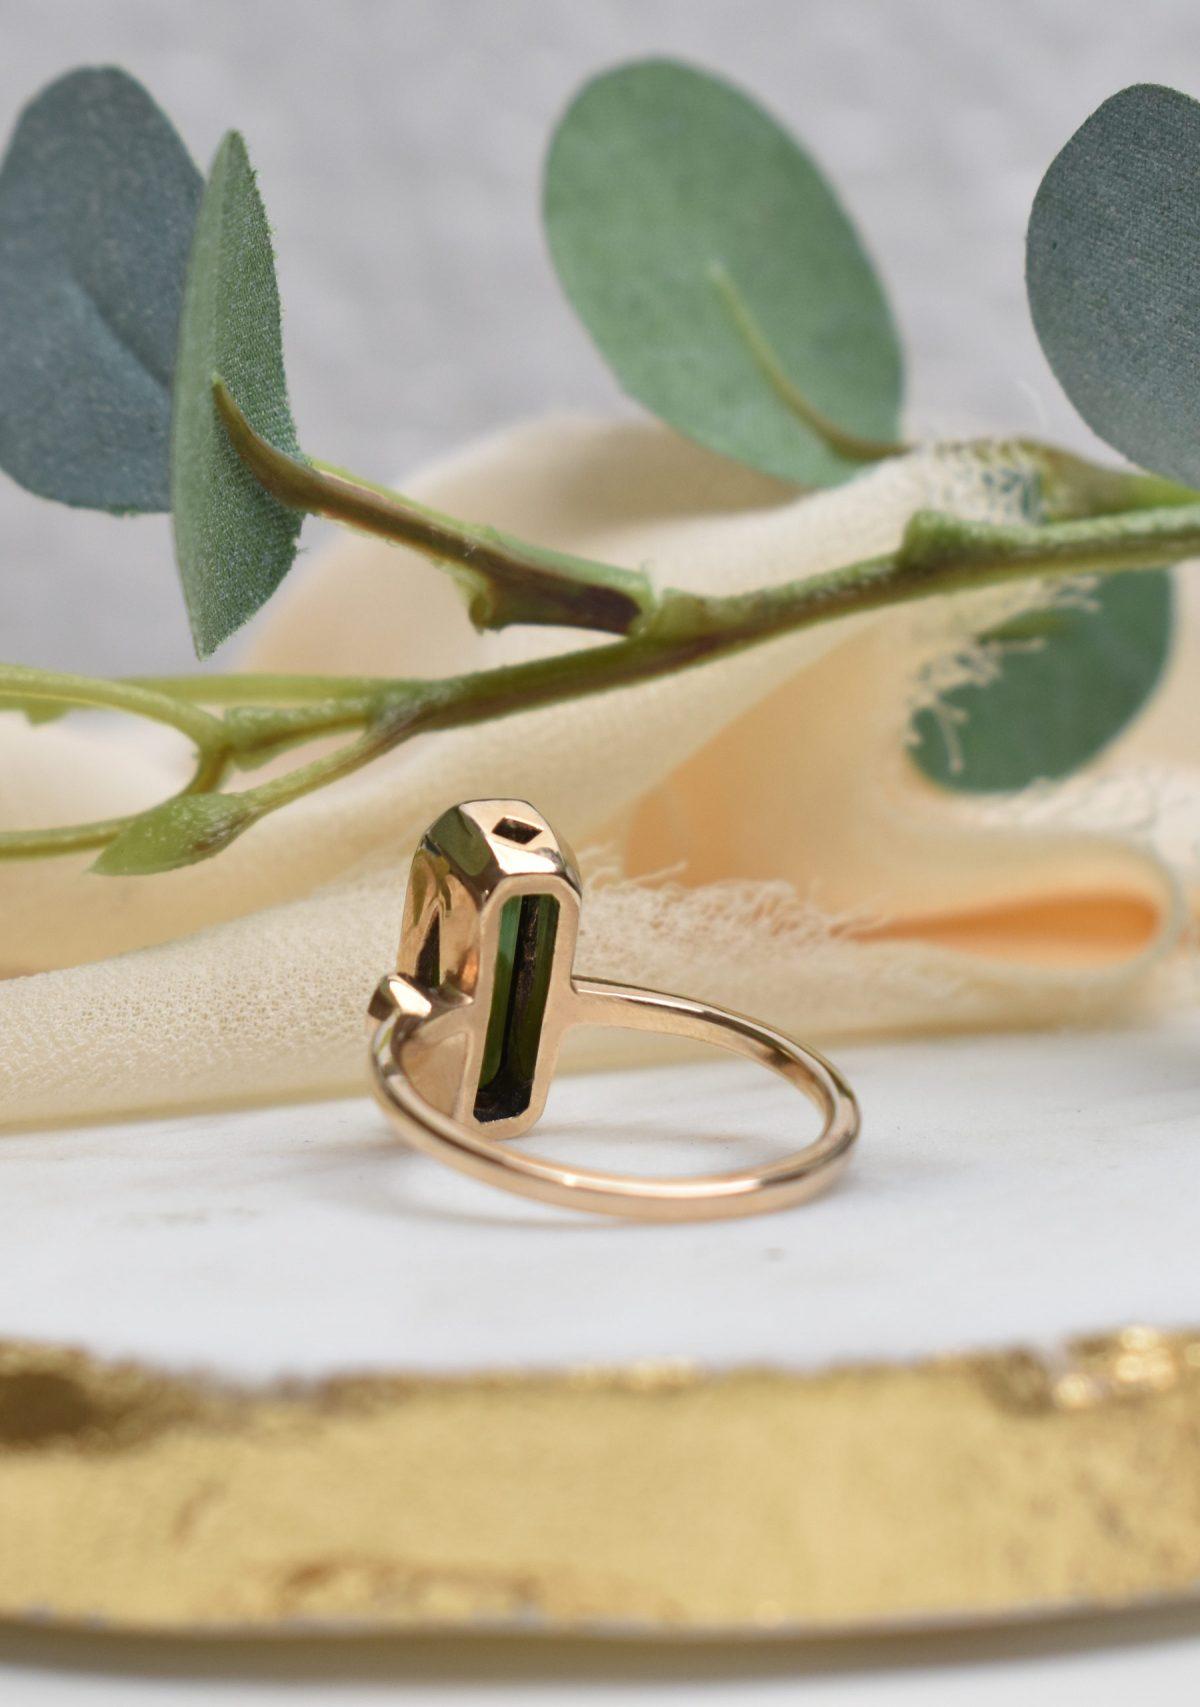 Saint K Ivy Green Tourmaline and Diamond Ring